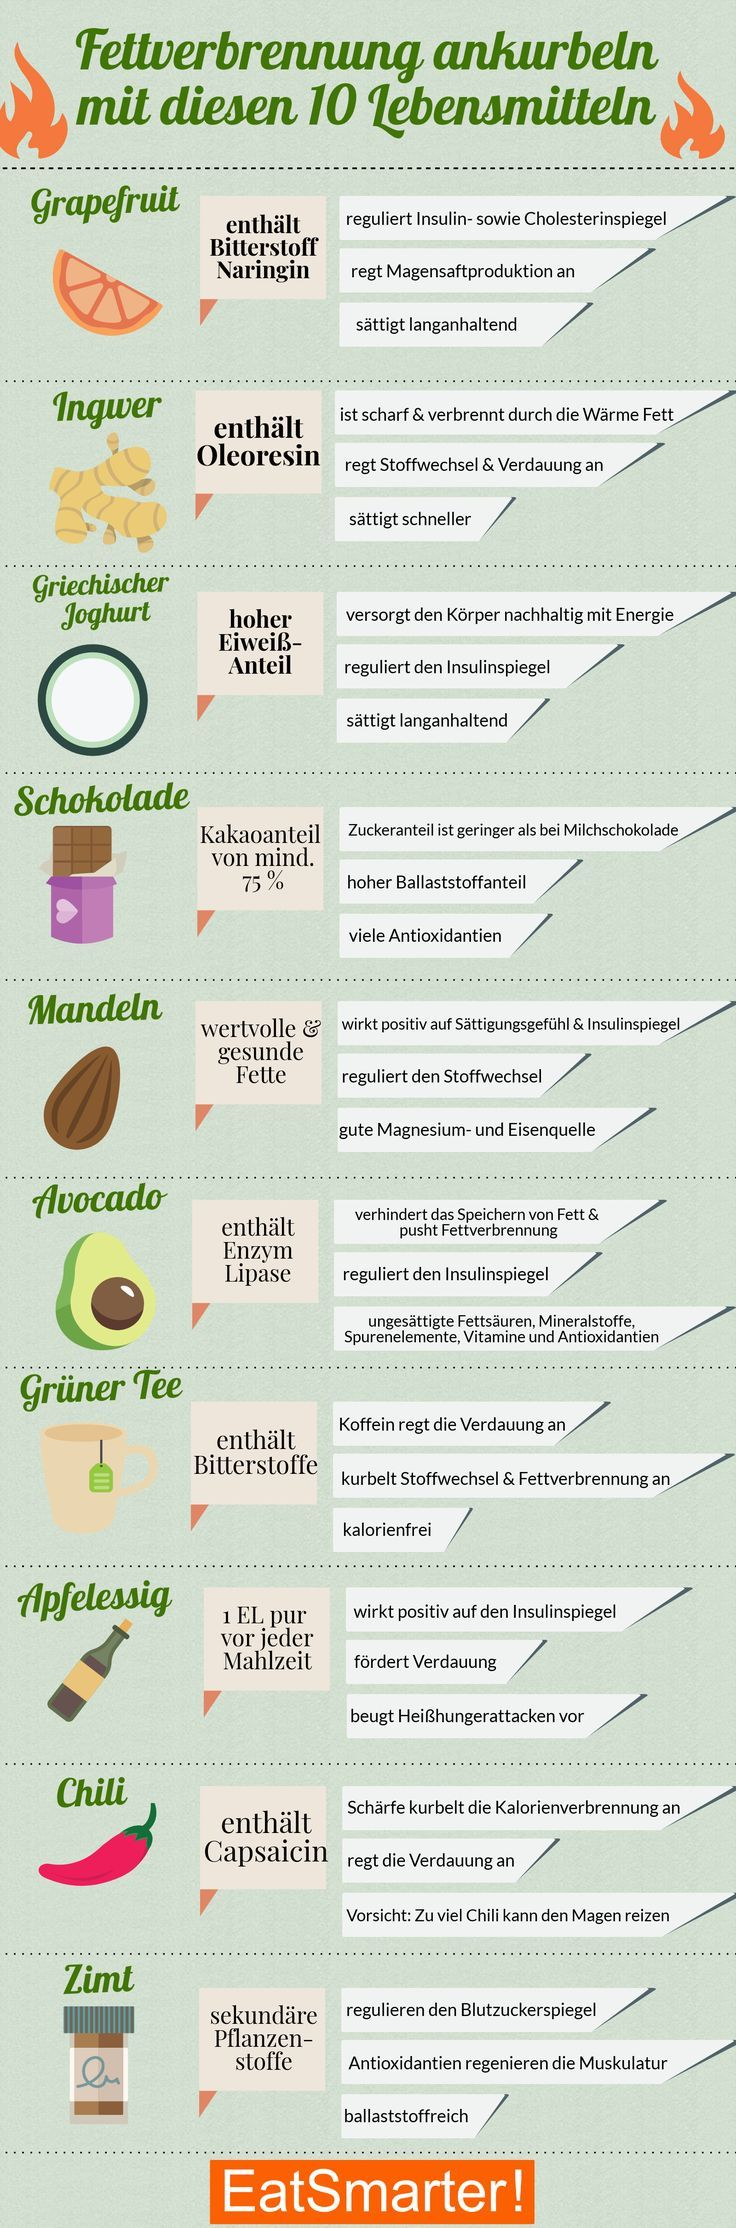 Fettverbrennung ankurbeln: Die Top 10 Lebensmittel – healthy forces – Abnehmen Tipps, Rezepte & Ernährungsplan